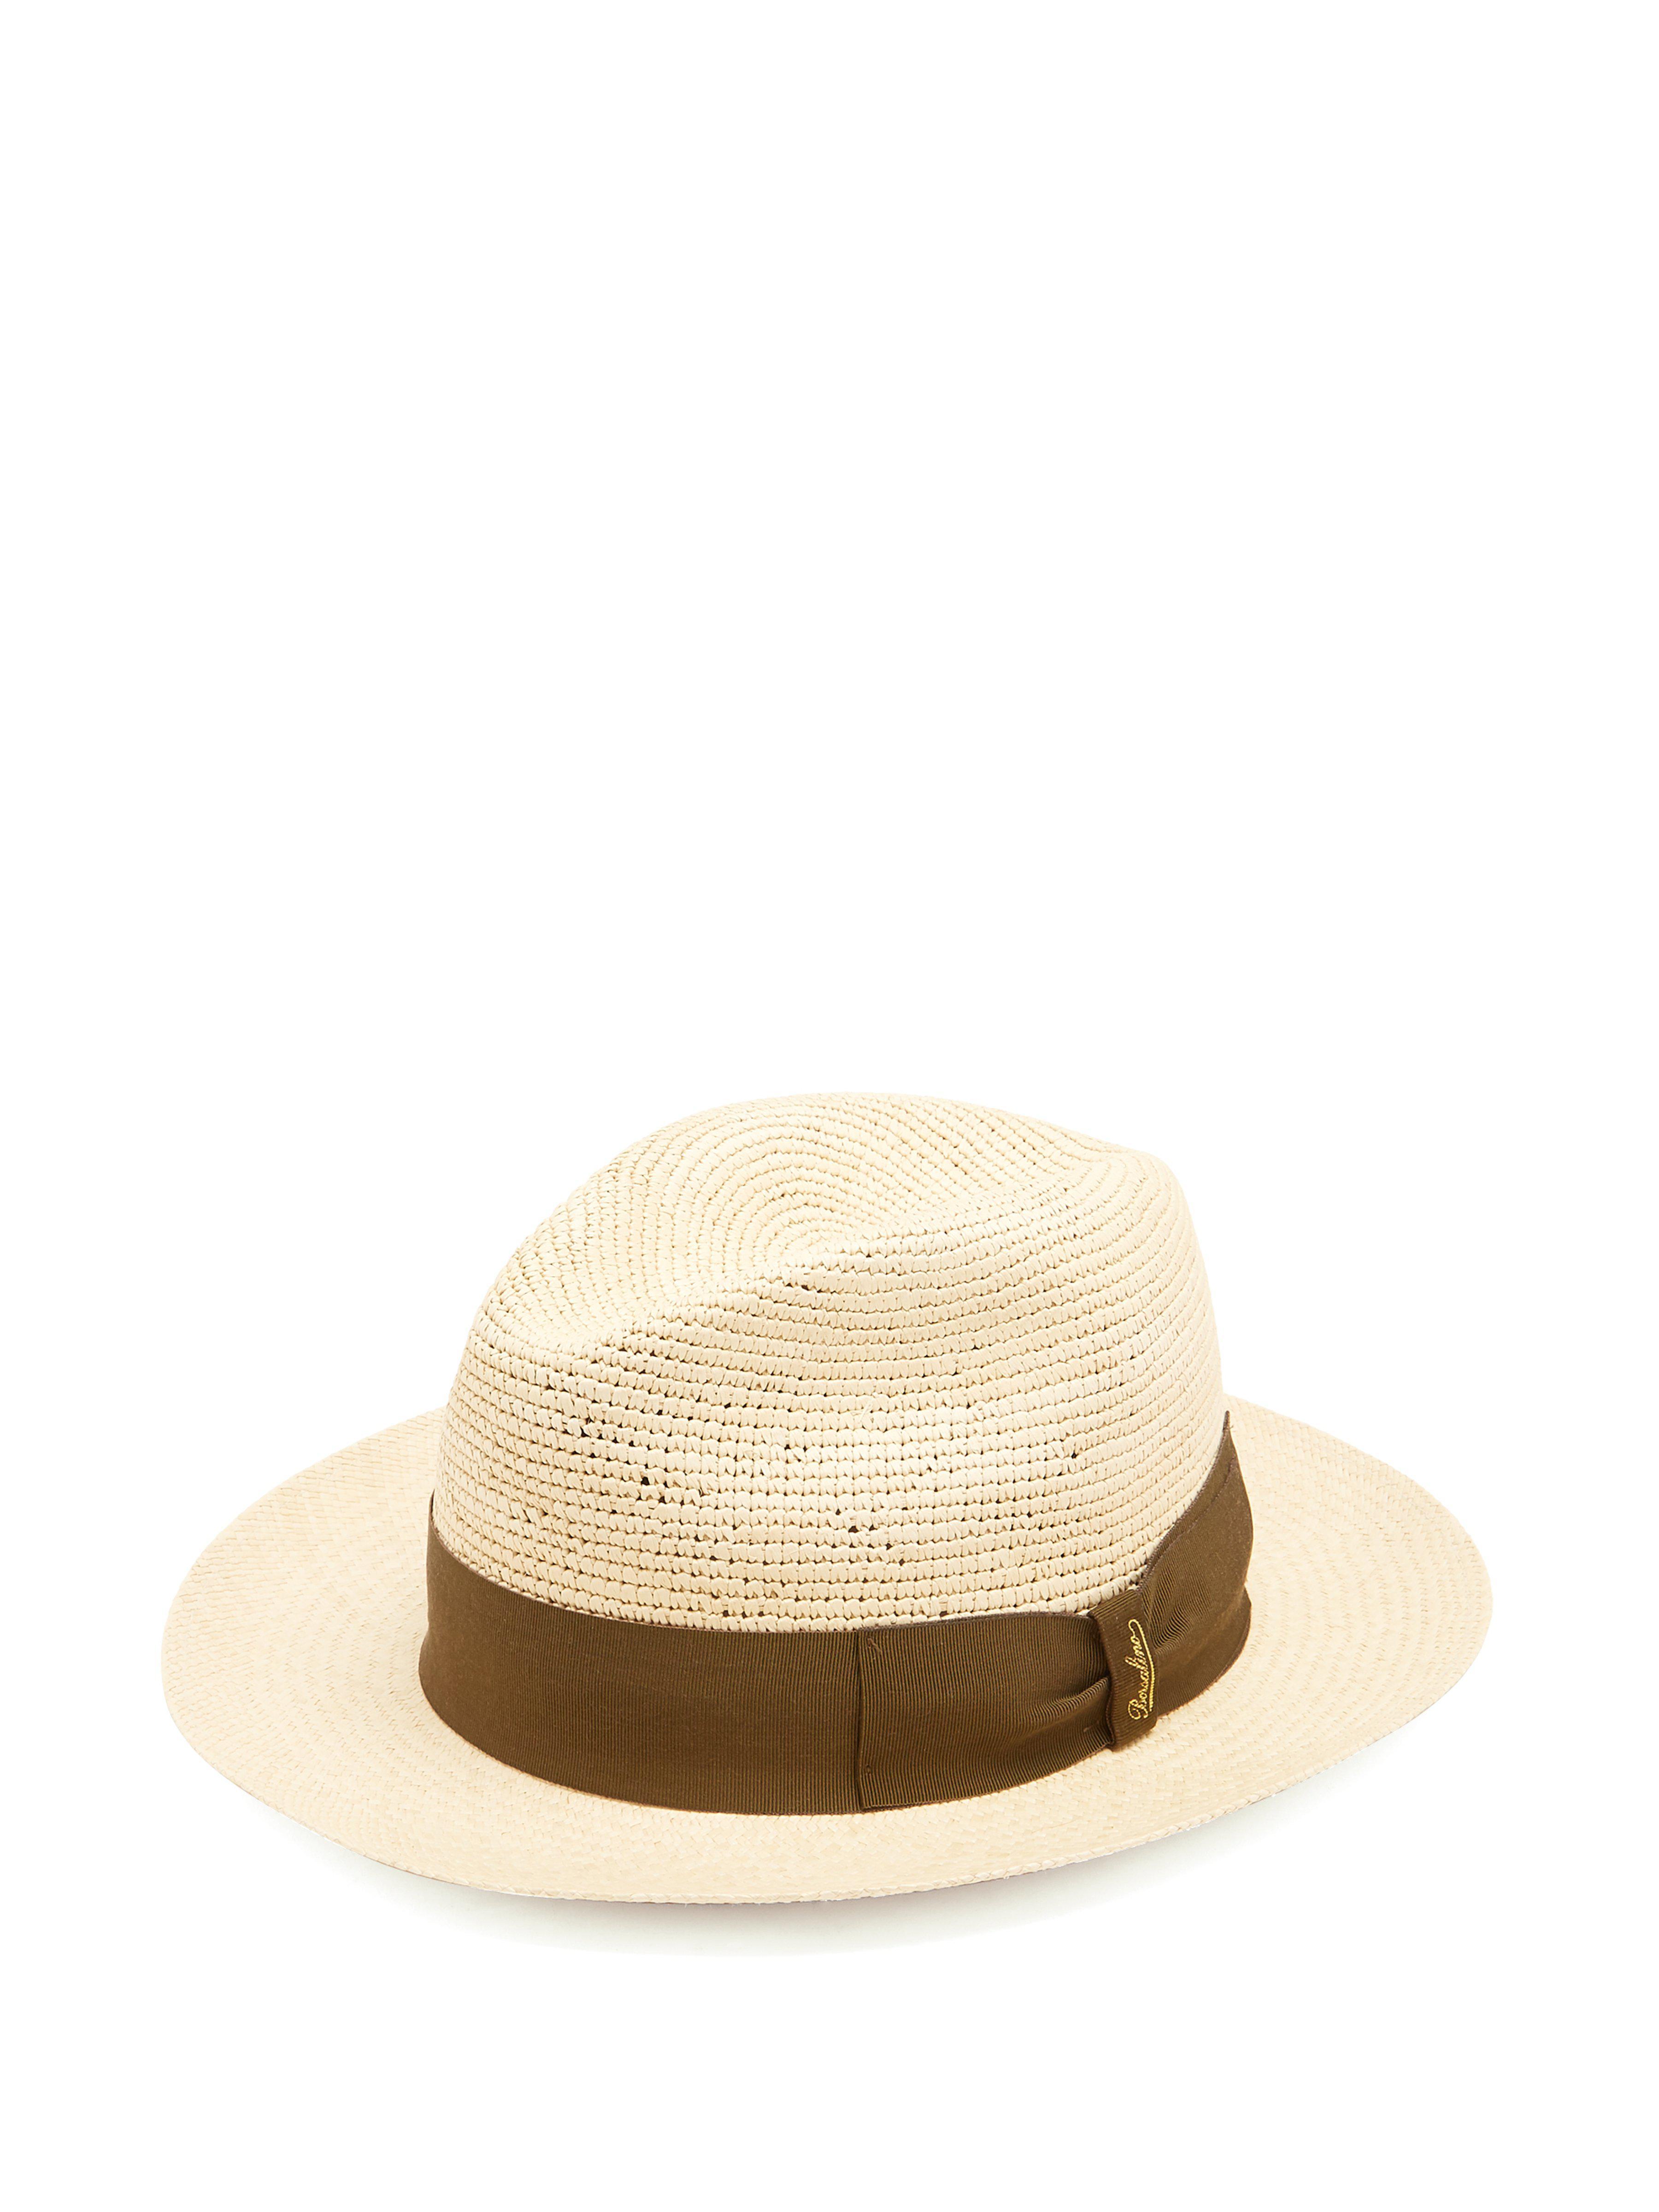 b0e69beb305 Borsalino Woven And Crochet Straw Panama Hat in Natural for Men - Lyst